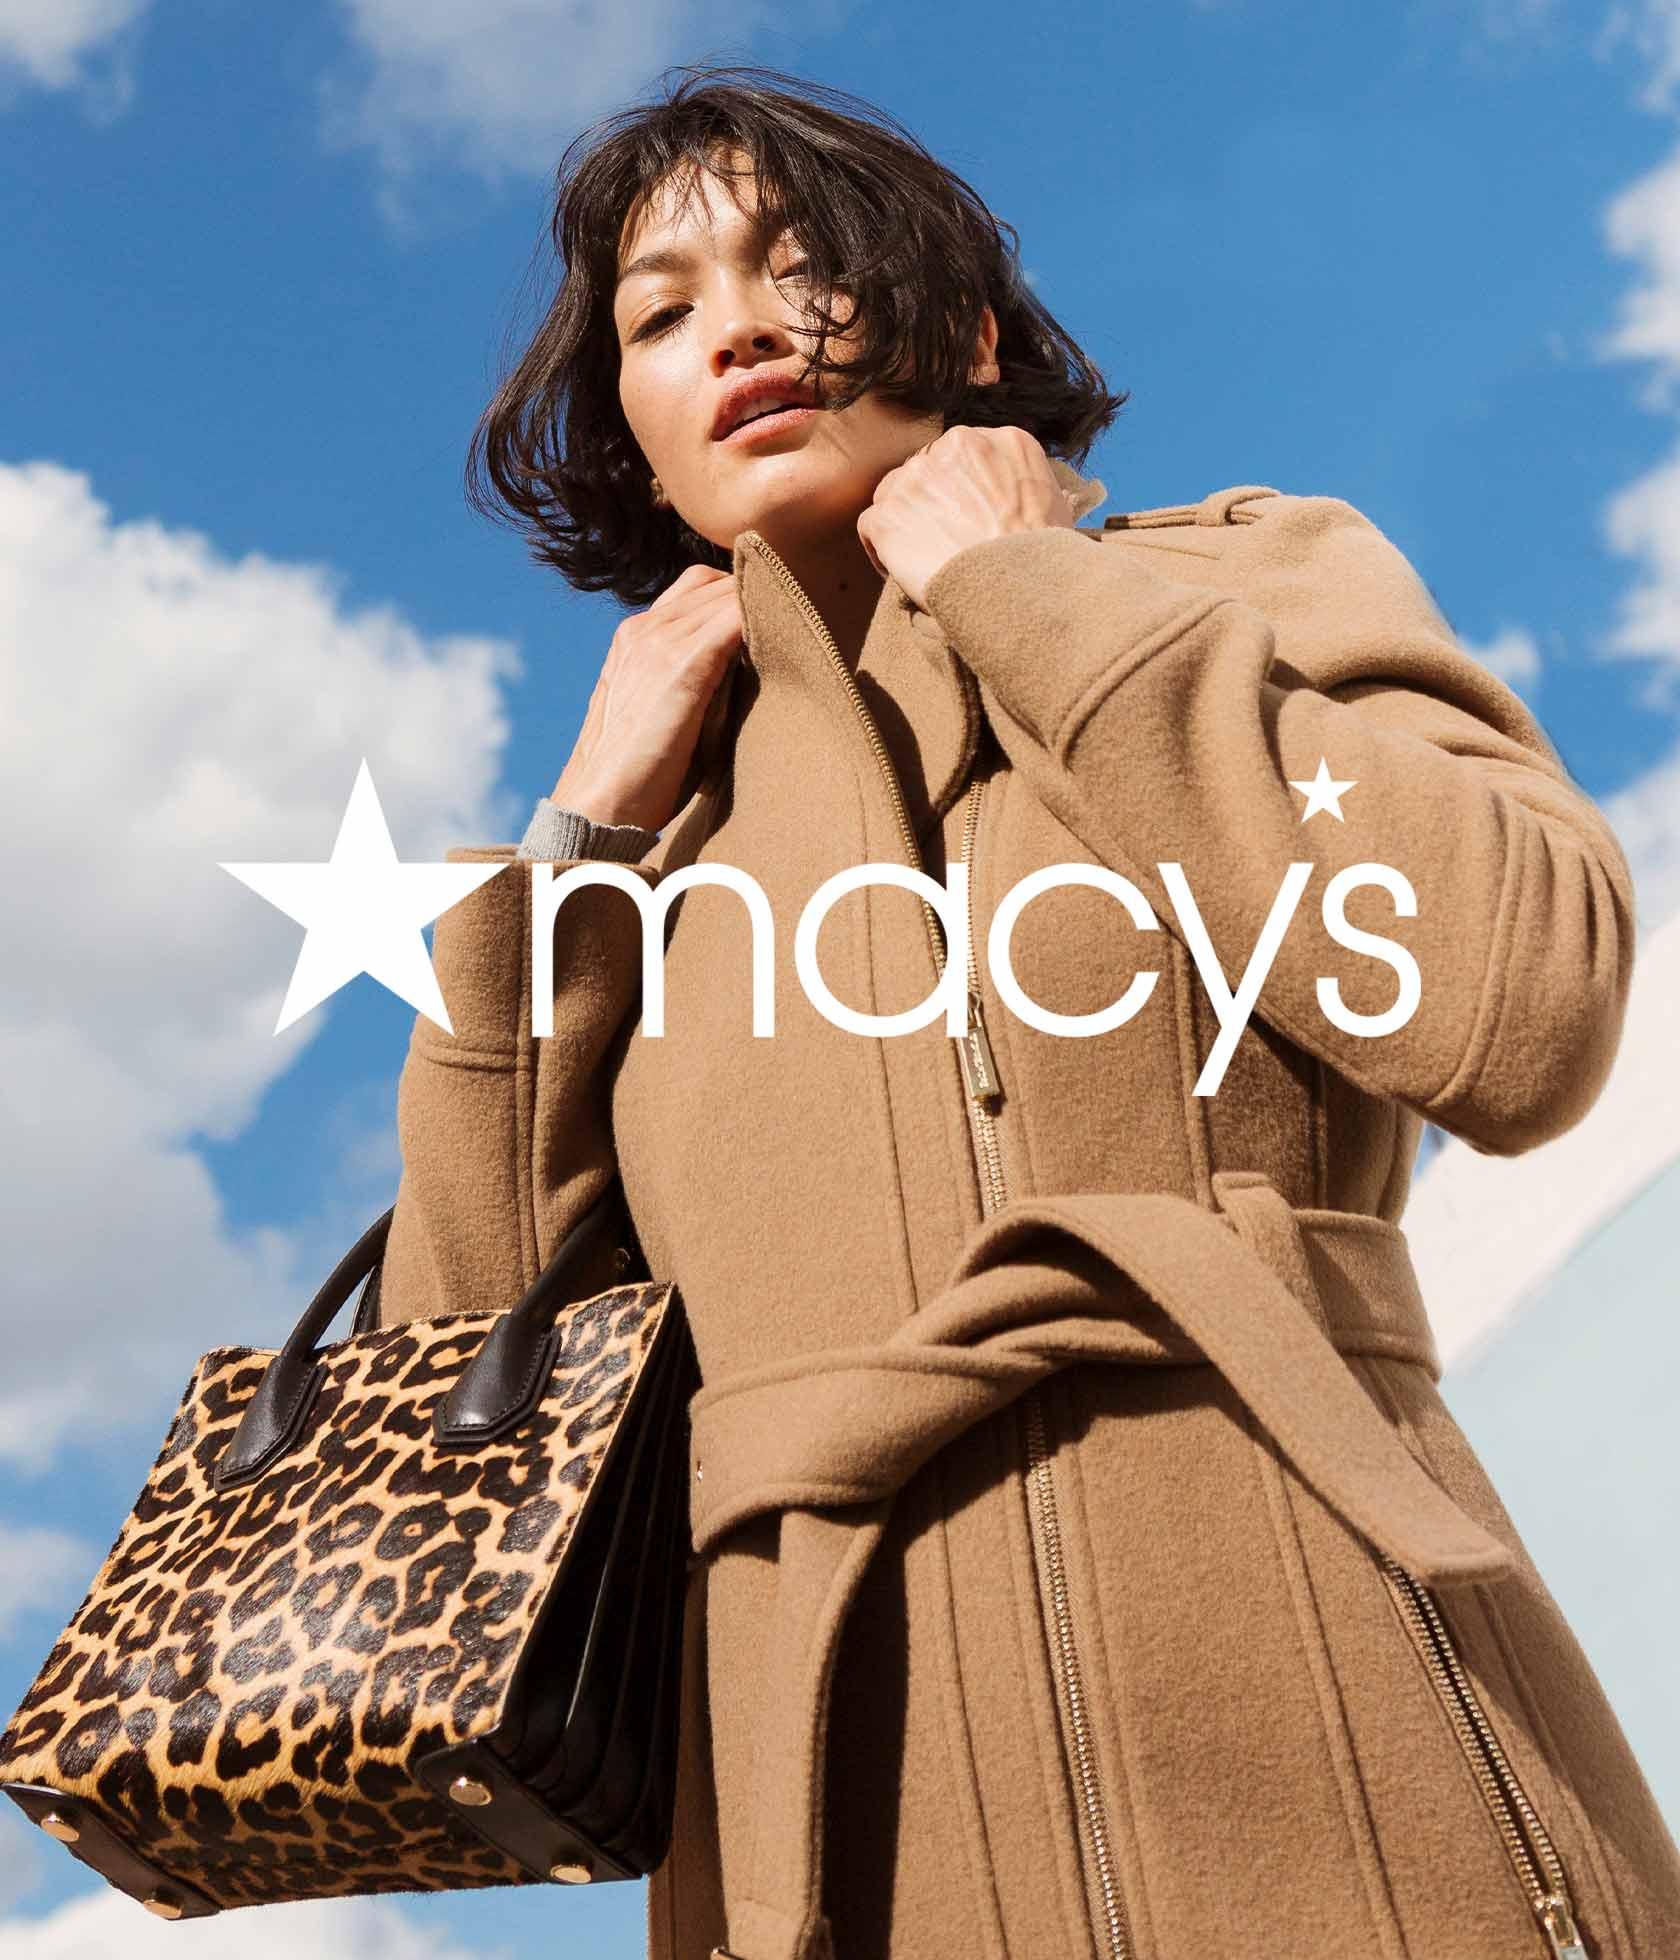 Macy logo